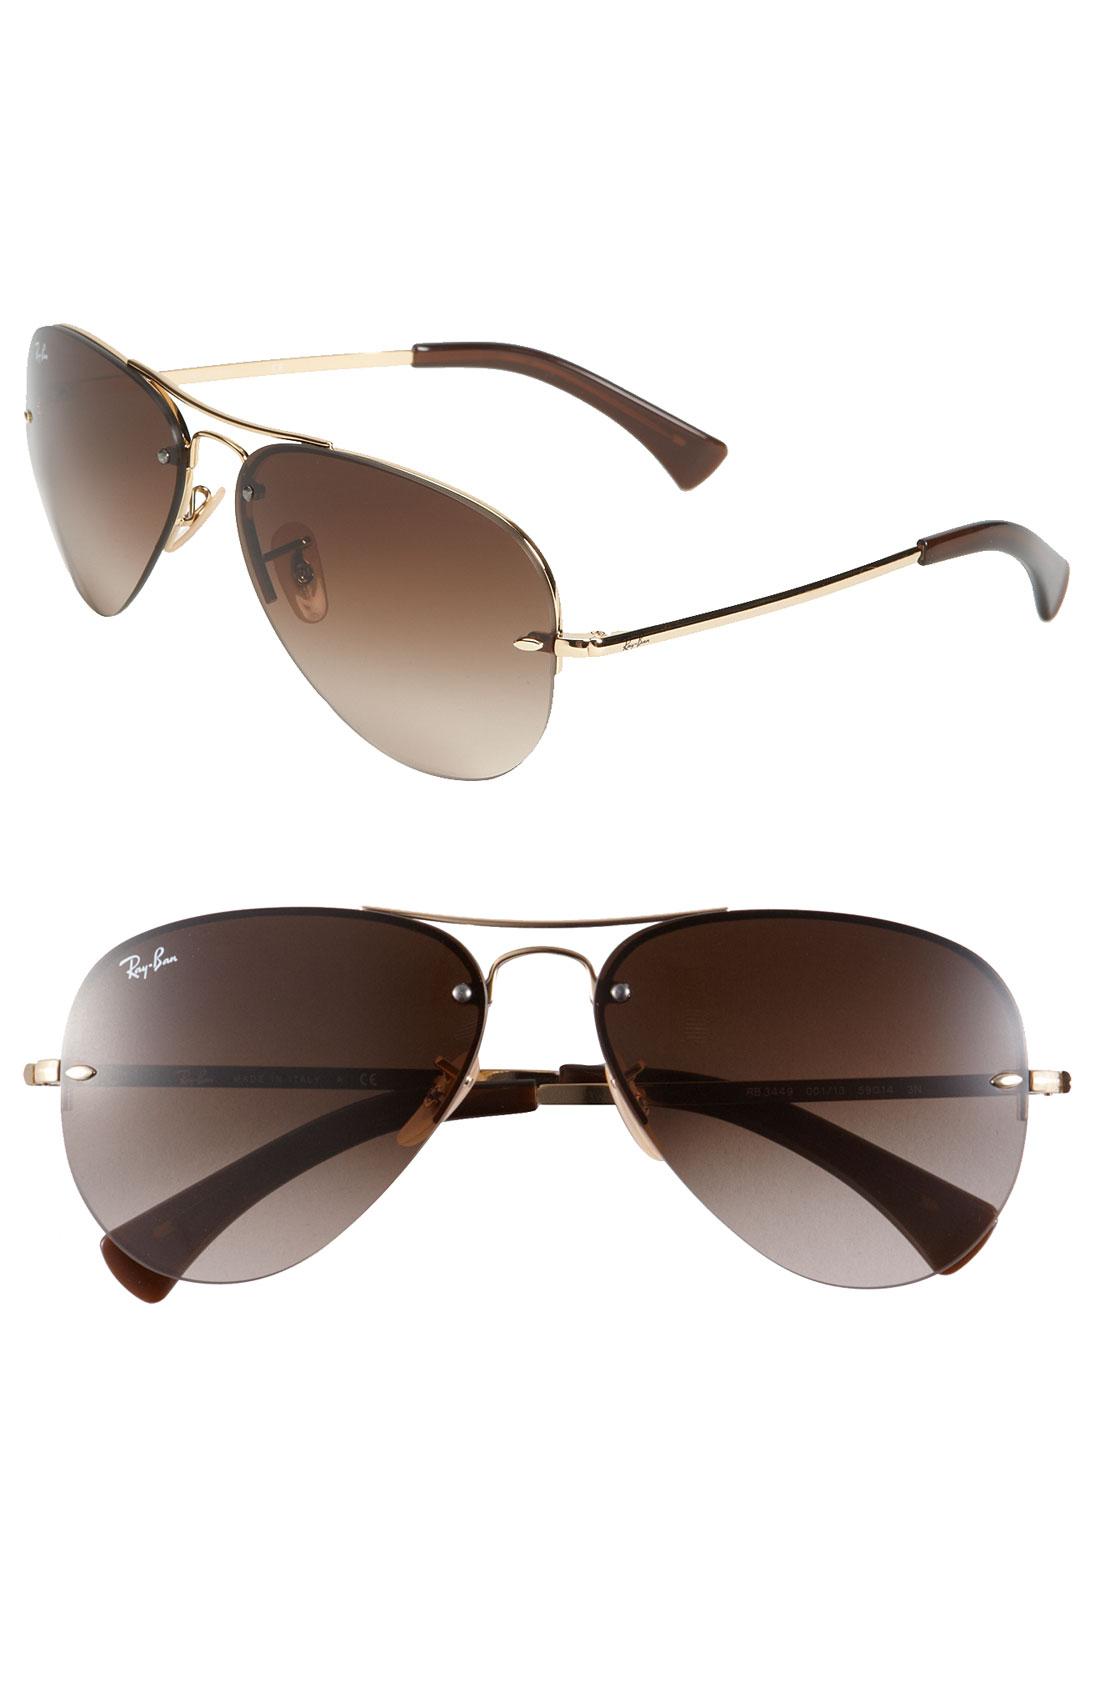 Ray-ban 59Mm Semi Rimless Aviator Sunglasses in Gold ...